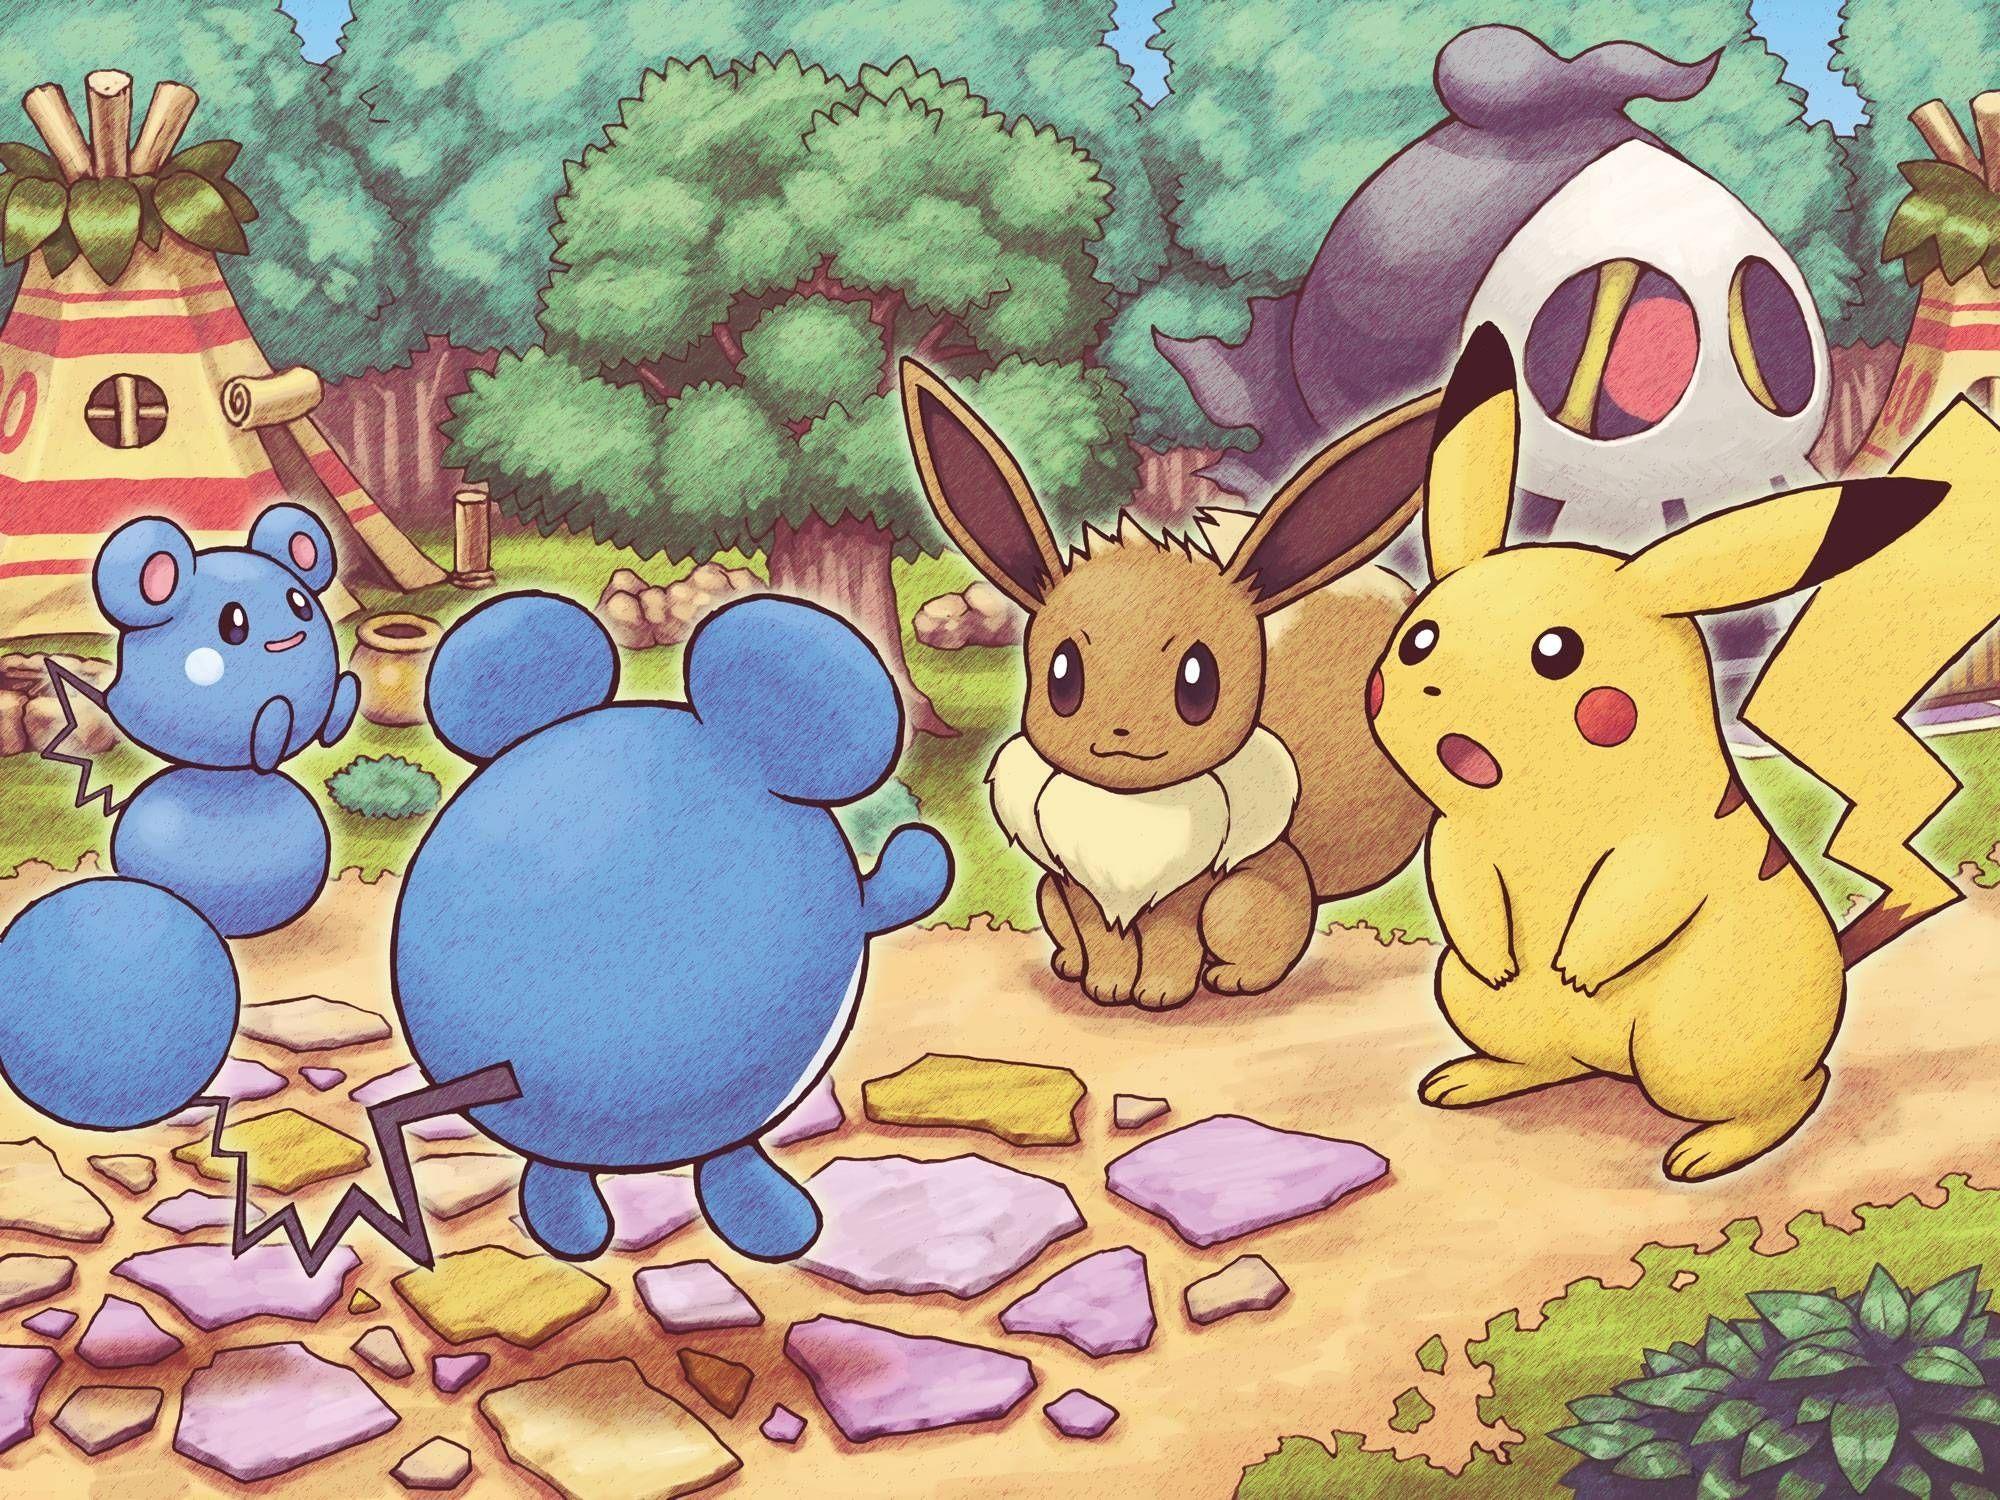 10 Latest Pokemon Mystery Dungeon Wallpaper Full Hd 1920 1080 For Pc Desktop Pokemon Pokemon Dungeon Pokemon Teams